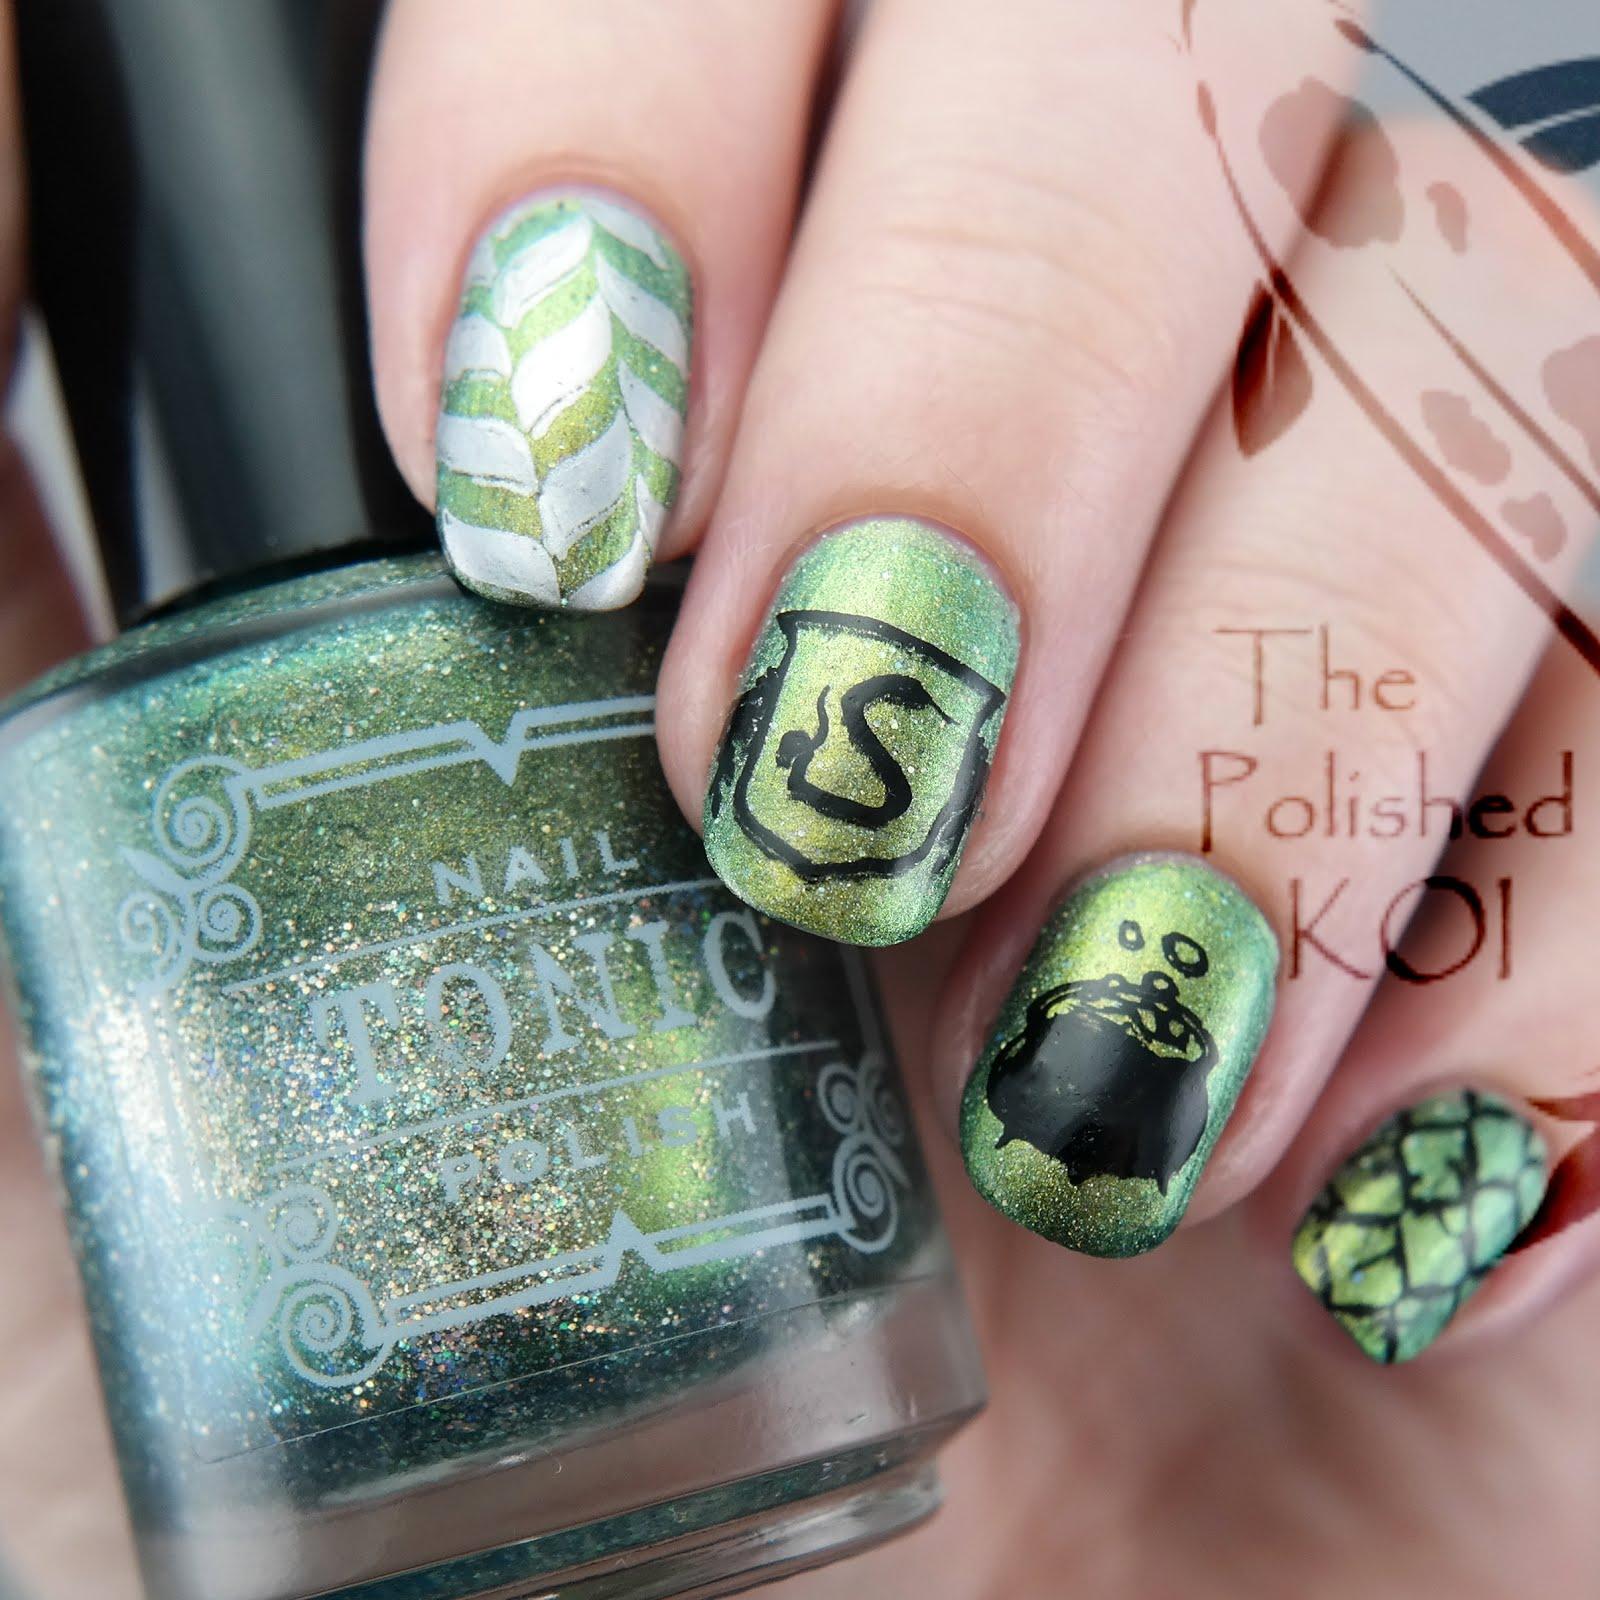 The Polished KOI: Miscellaneous Nail Art - January 2017